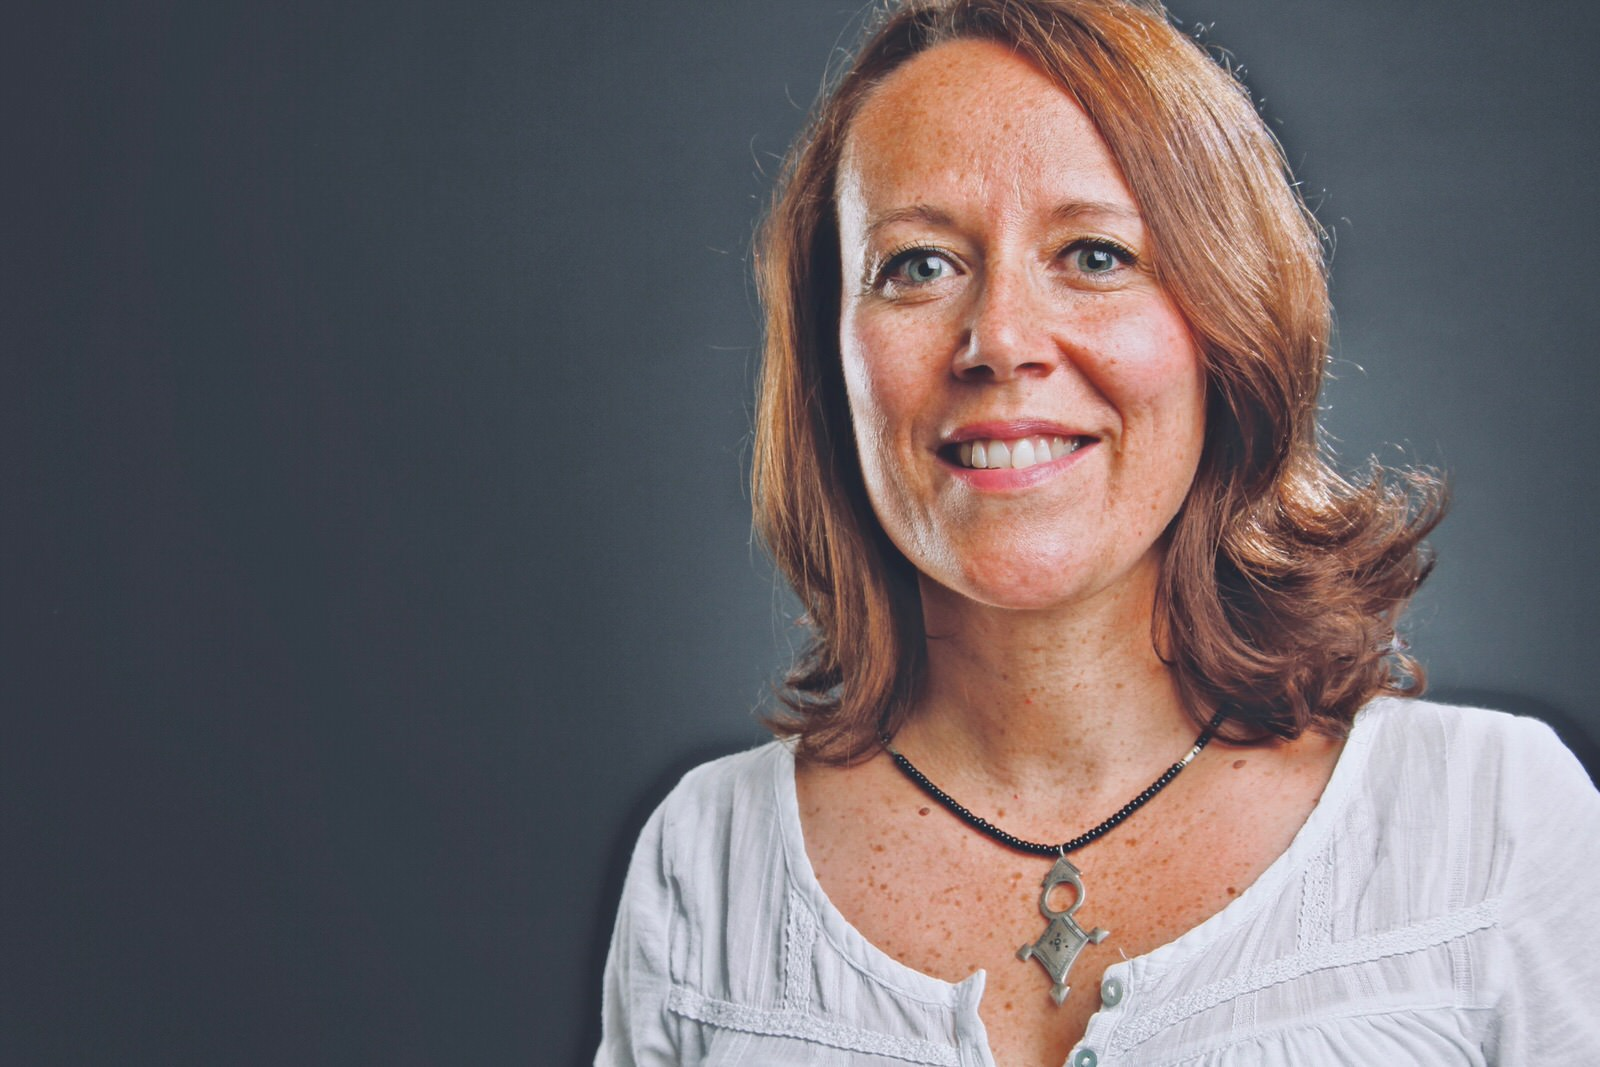 Julie Chauvet